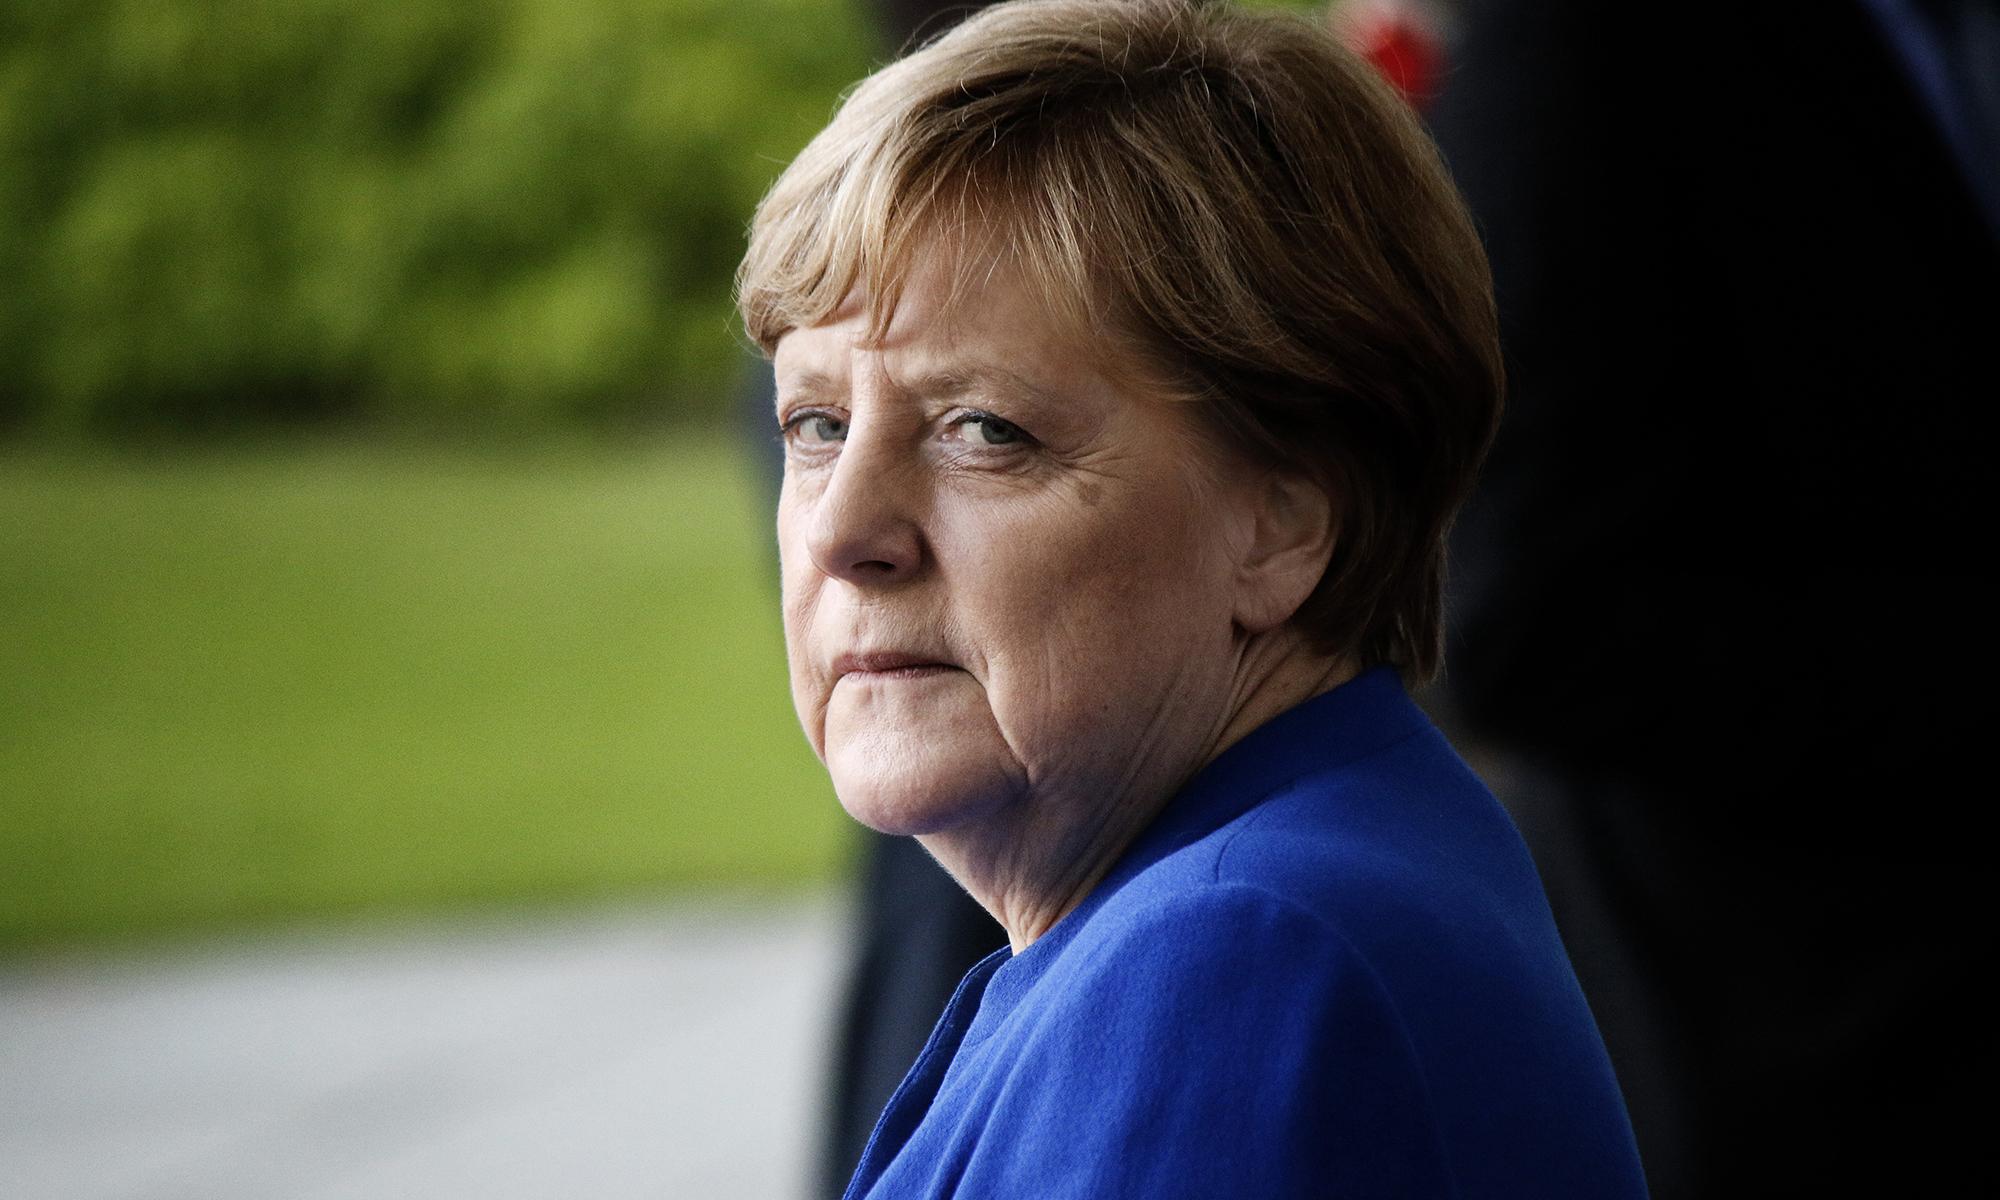 Das Merkel-Universum bekommt Risse